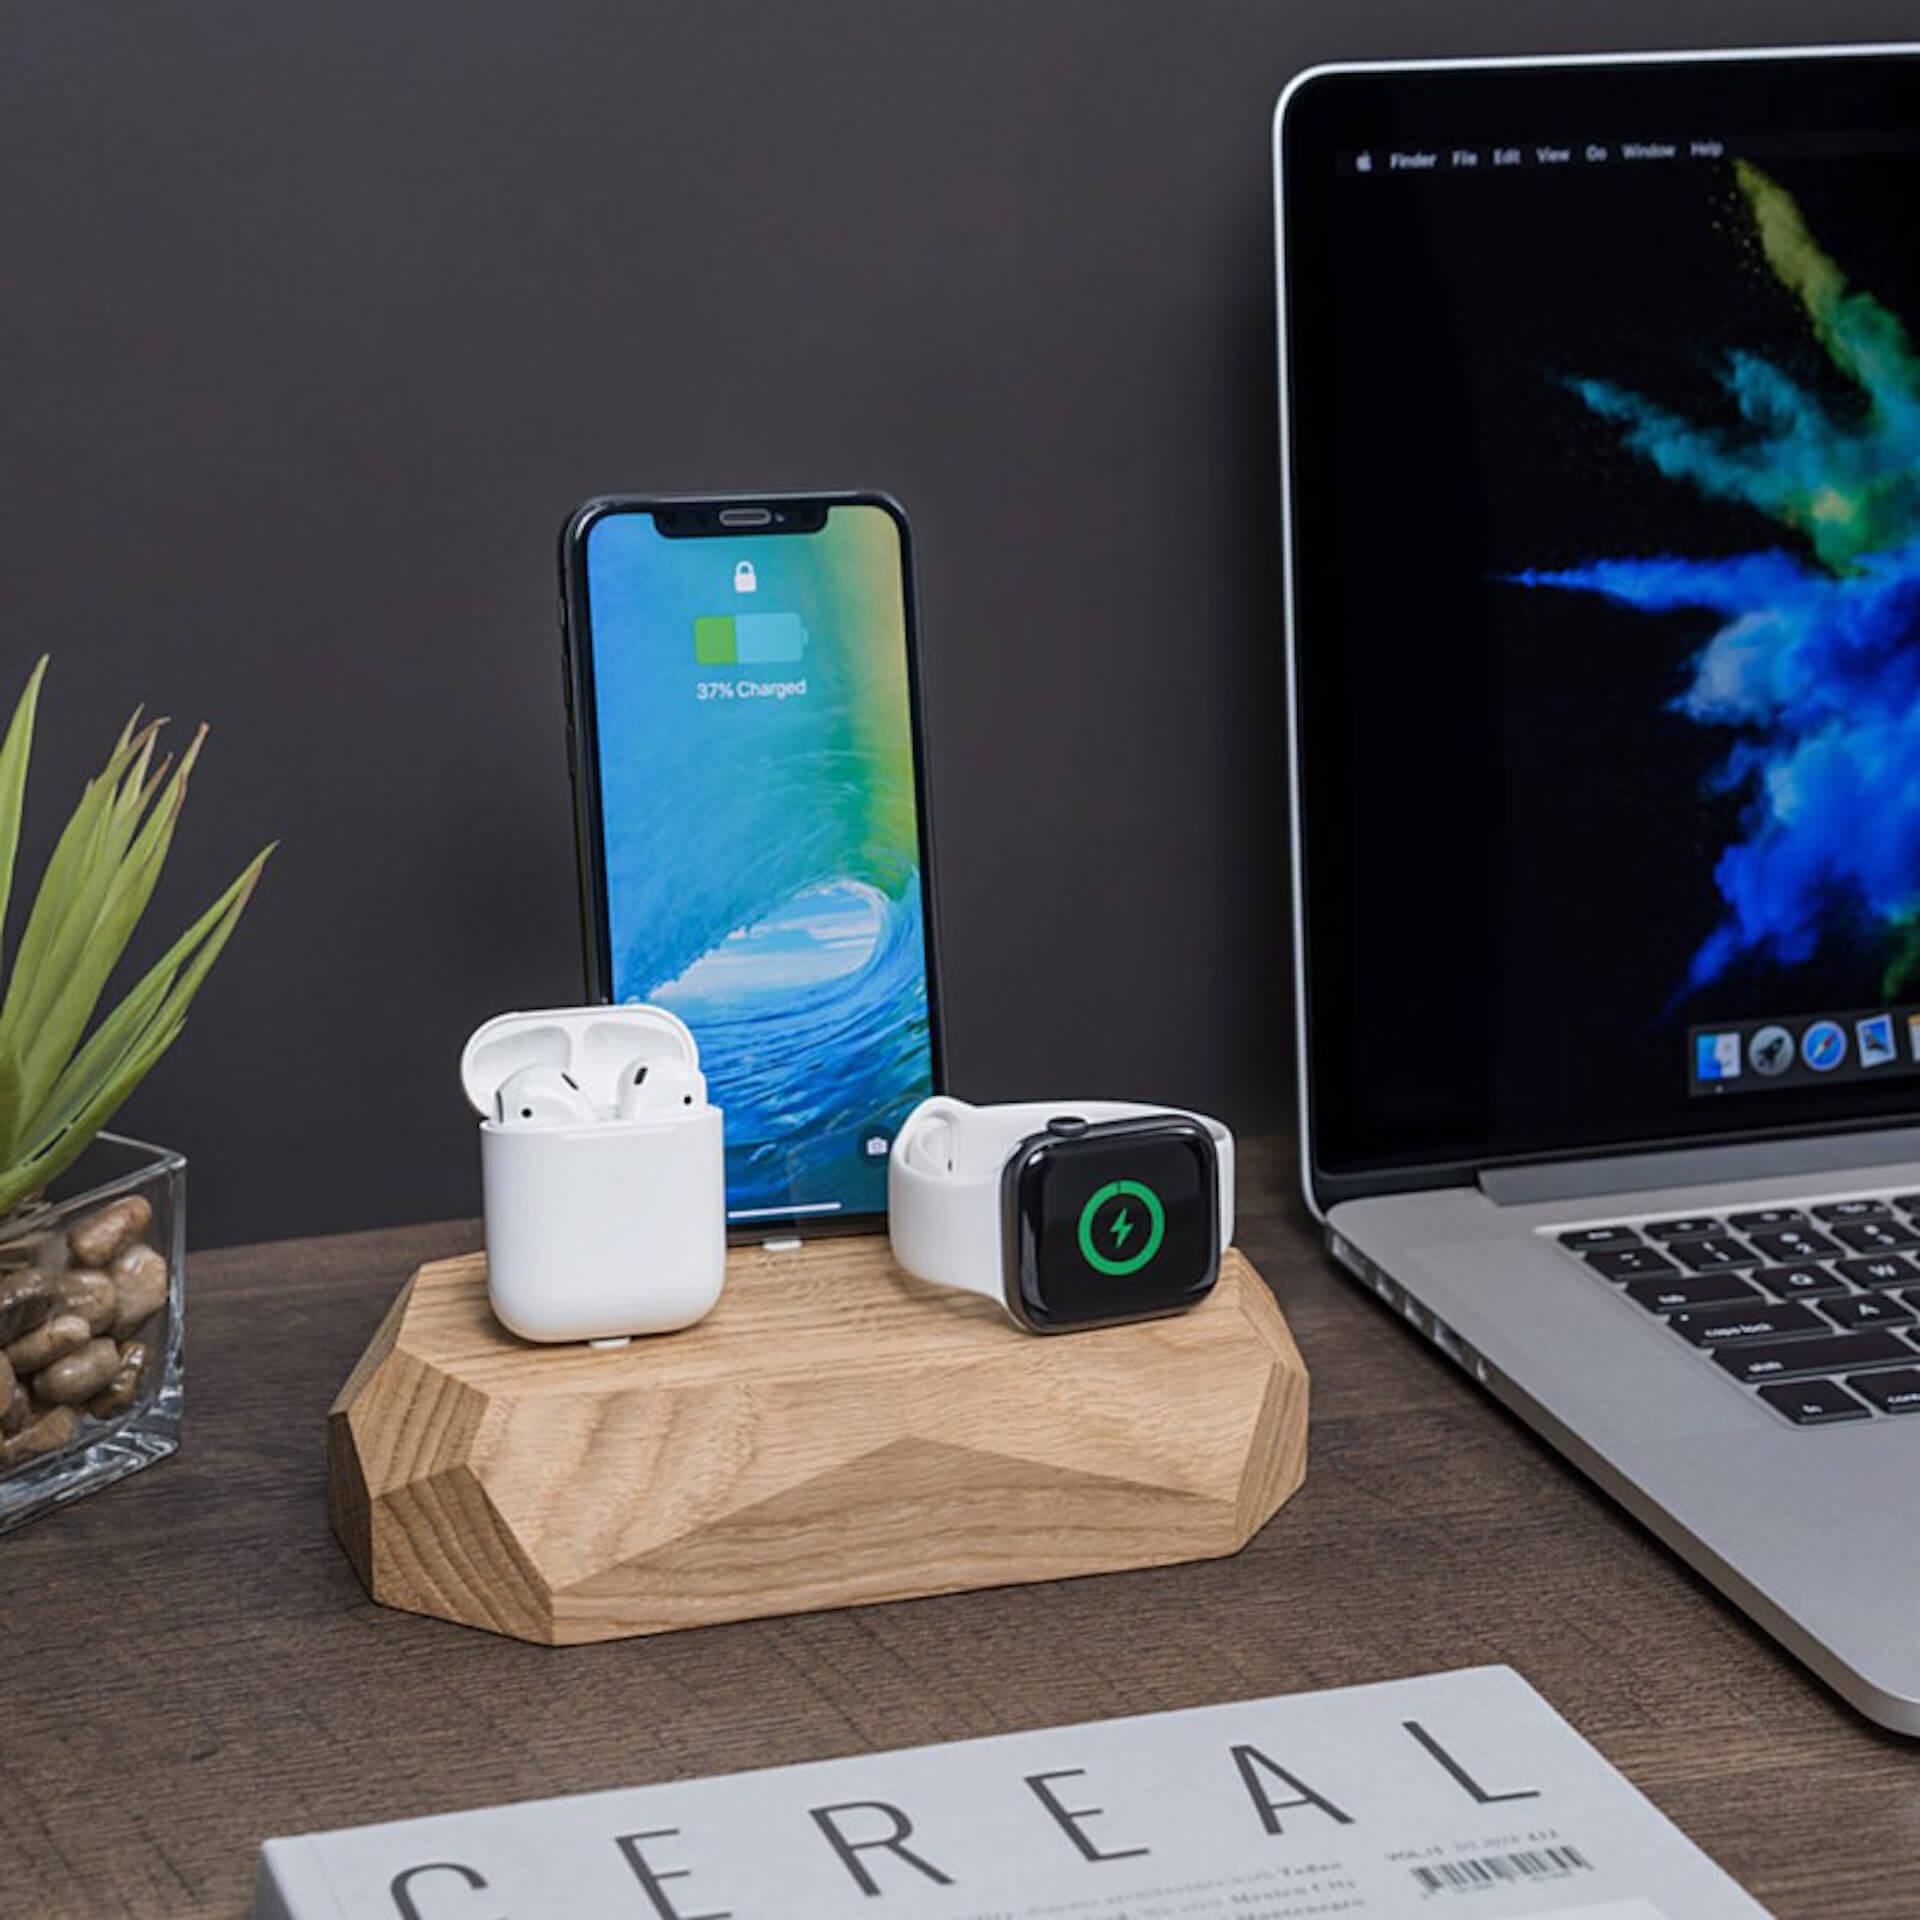 Apple製品をまとめて充電!デスク上をコンパクトにする木製充電ドック「3 in 1ドック」が登場